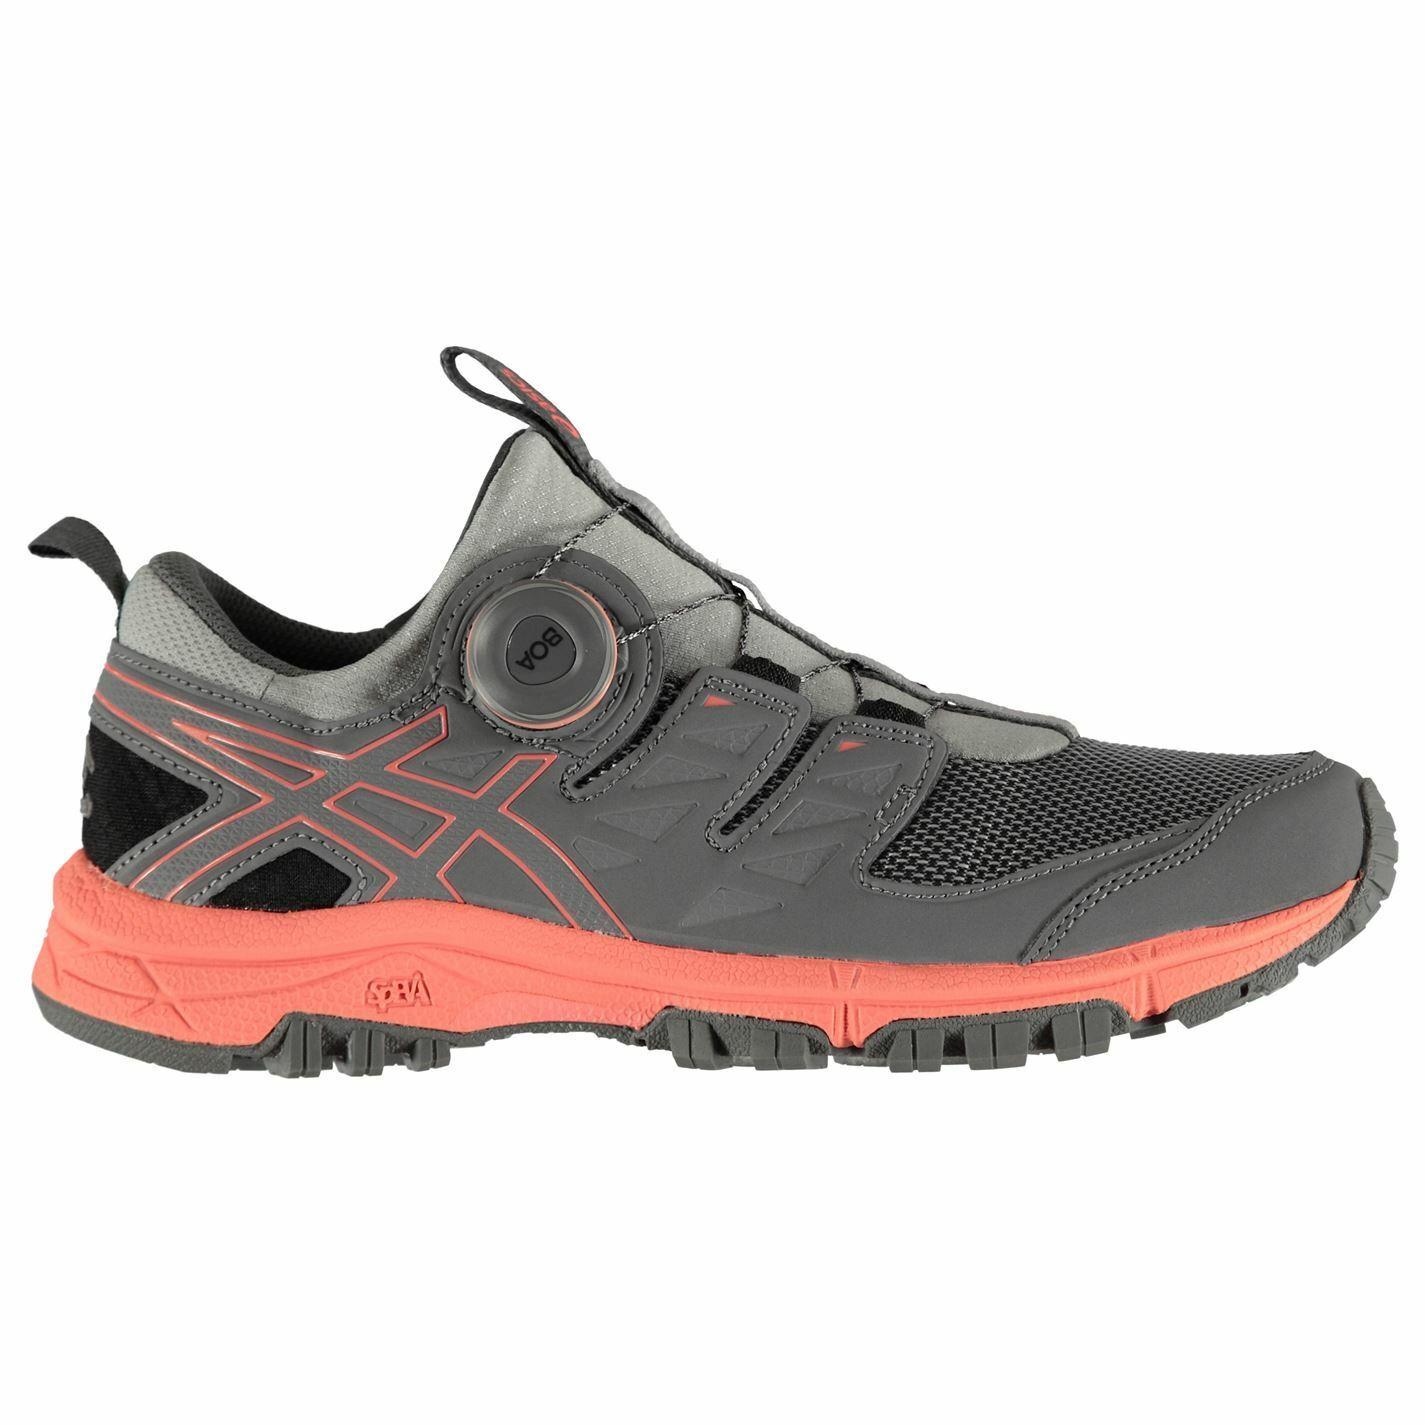 Asics Gel FujiRado Running shoes Ladies Trail